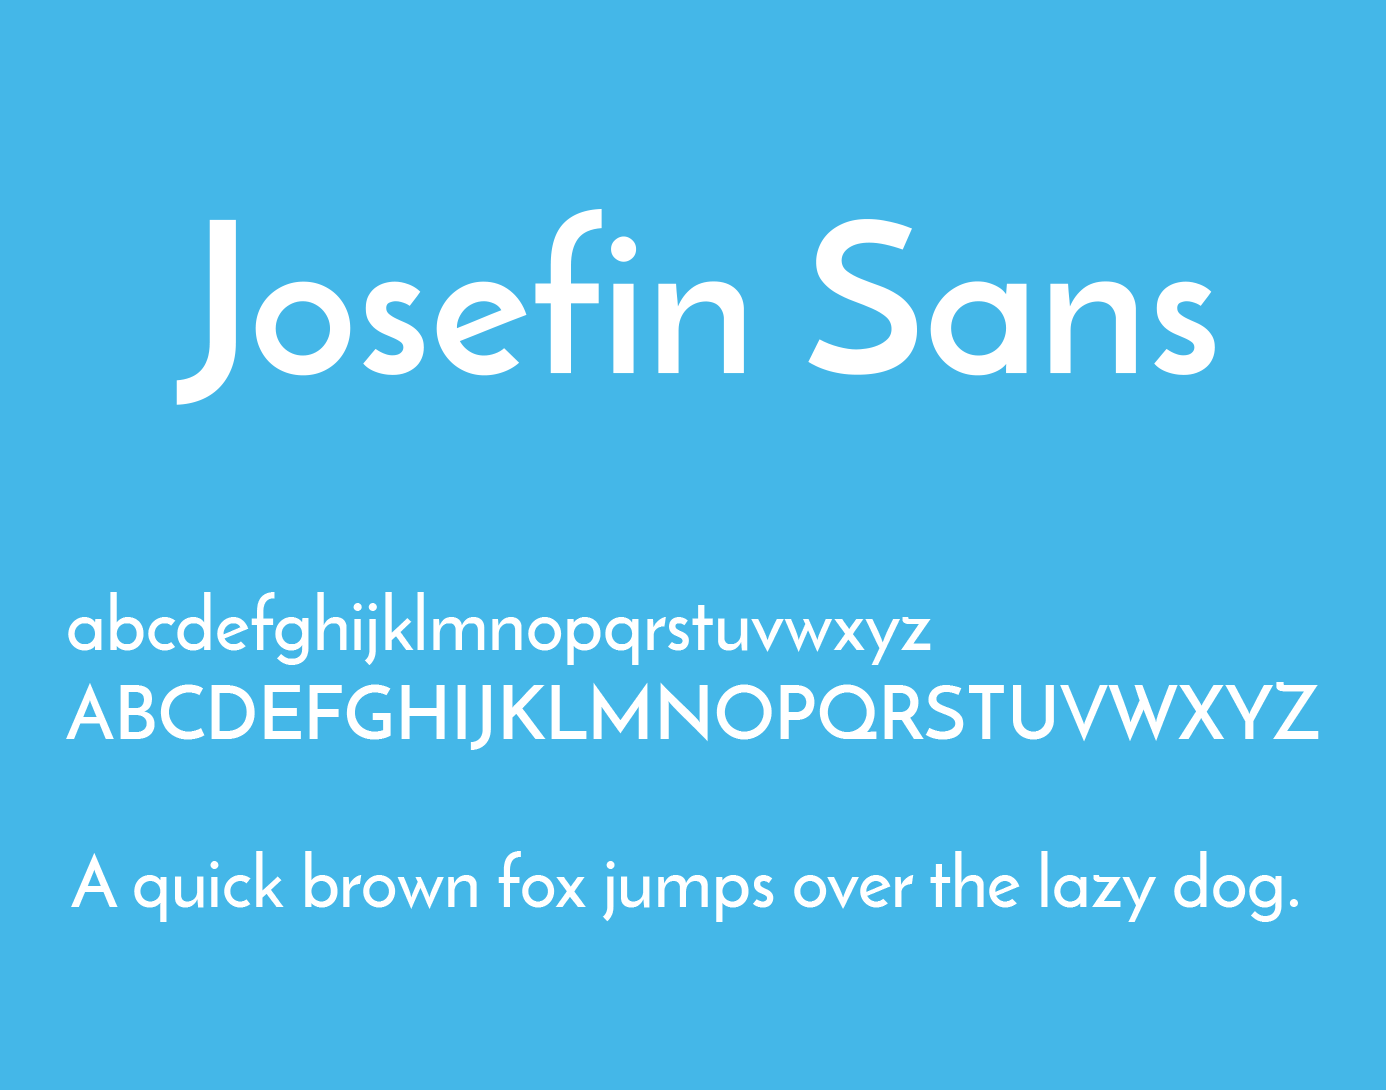 https://fontclarity.com/wp-content/uploads/2019/09/josefin-sans-font-download-0.png Free Download